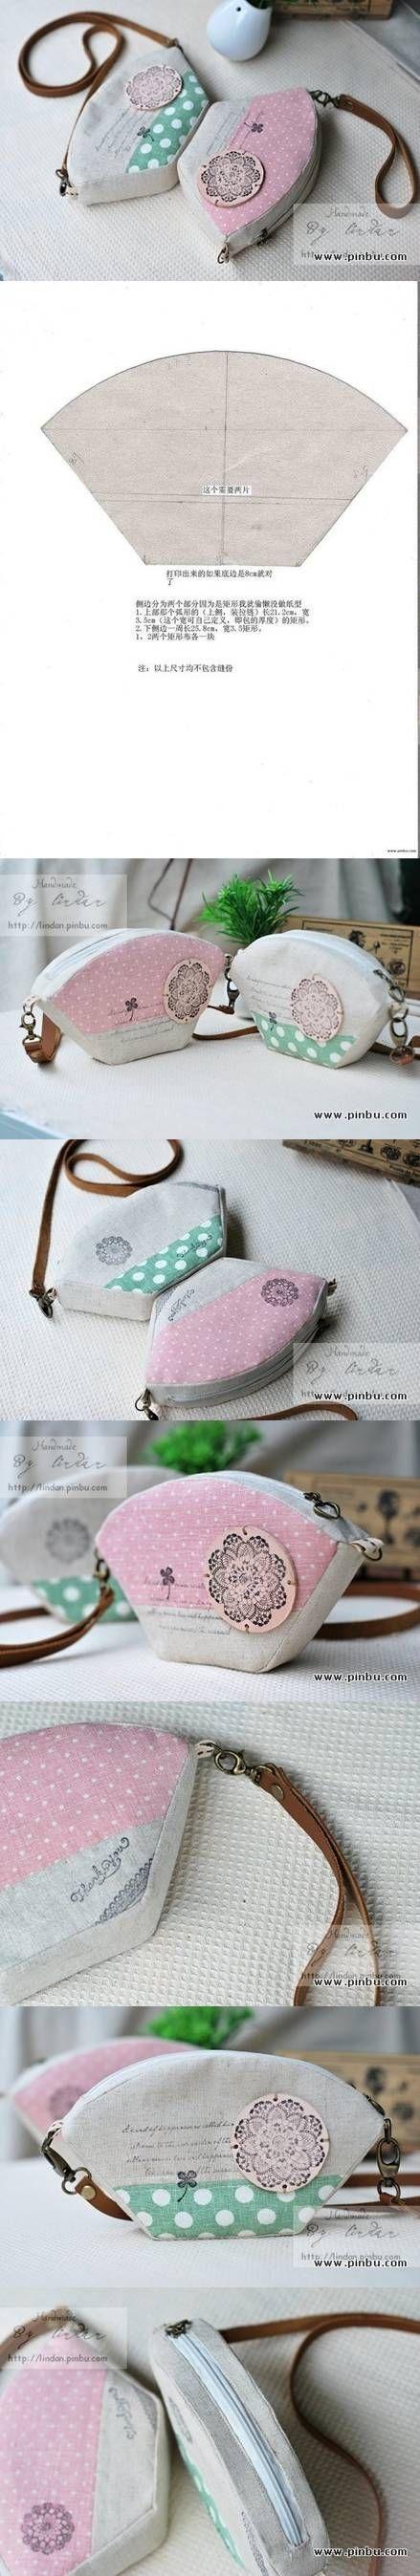 DIY Cool Mini Handbag